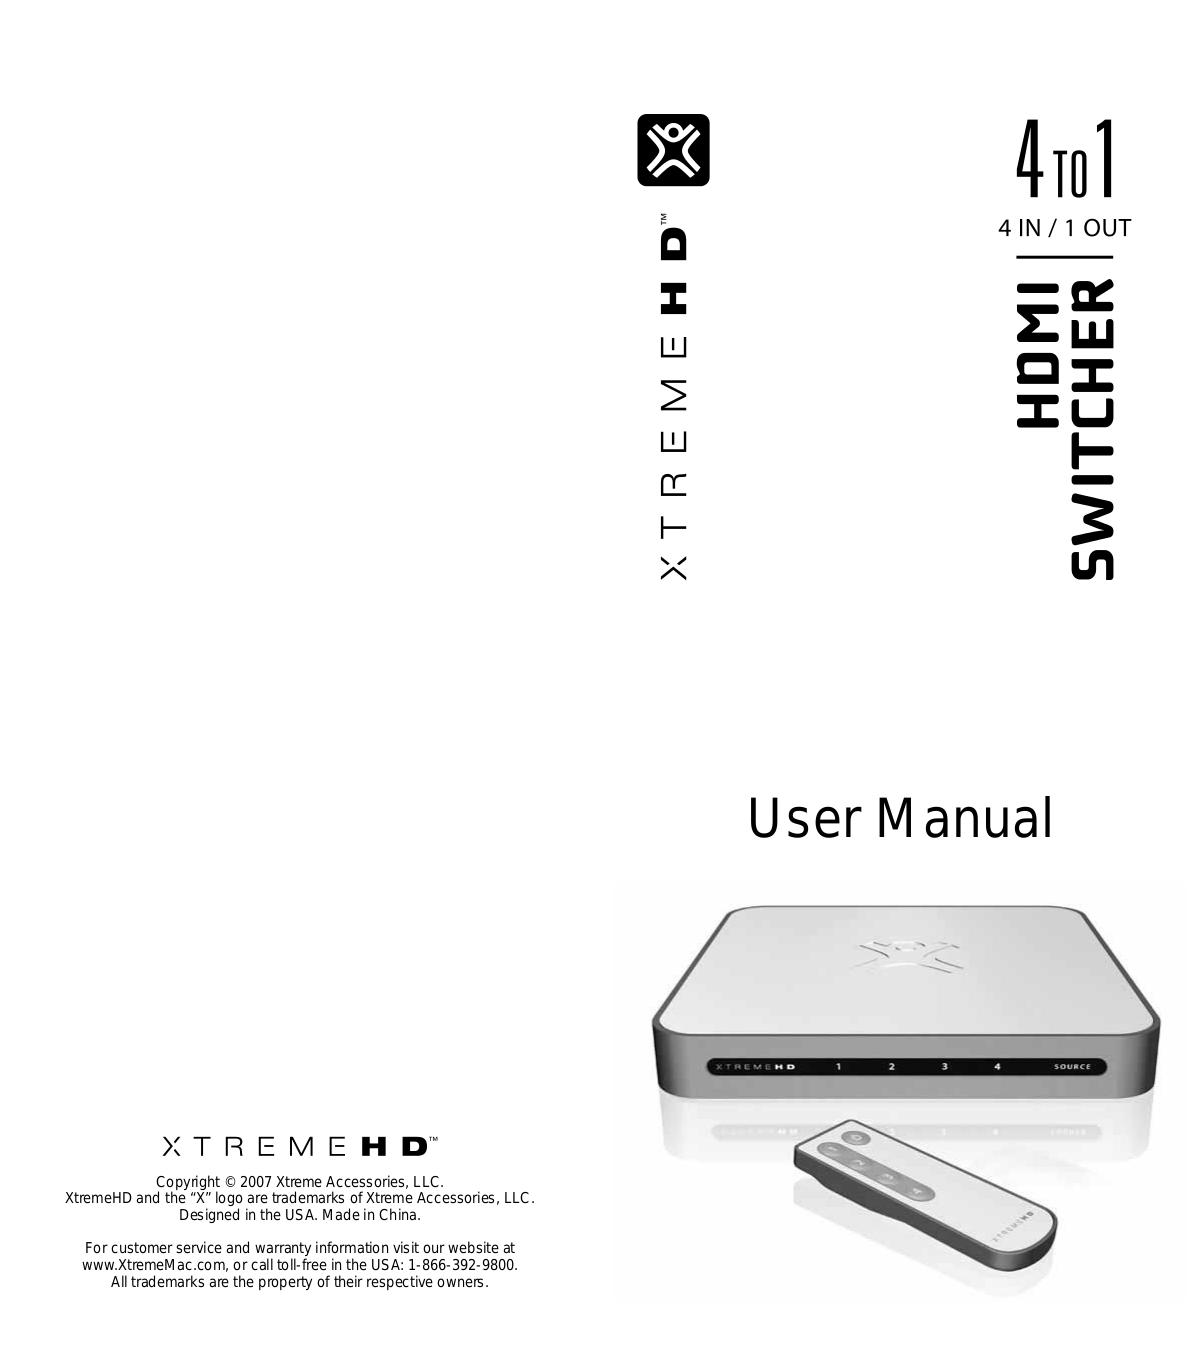 pdf for Xtrememac Switch XtremeHD manual